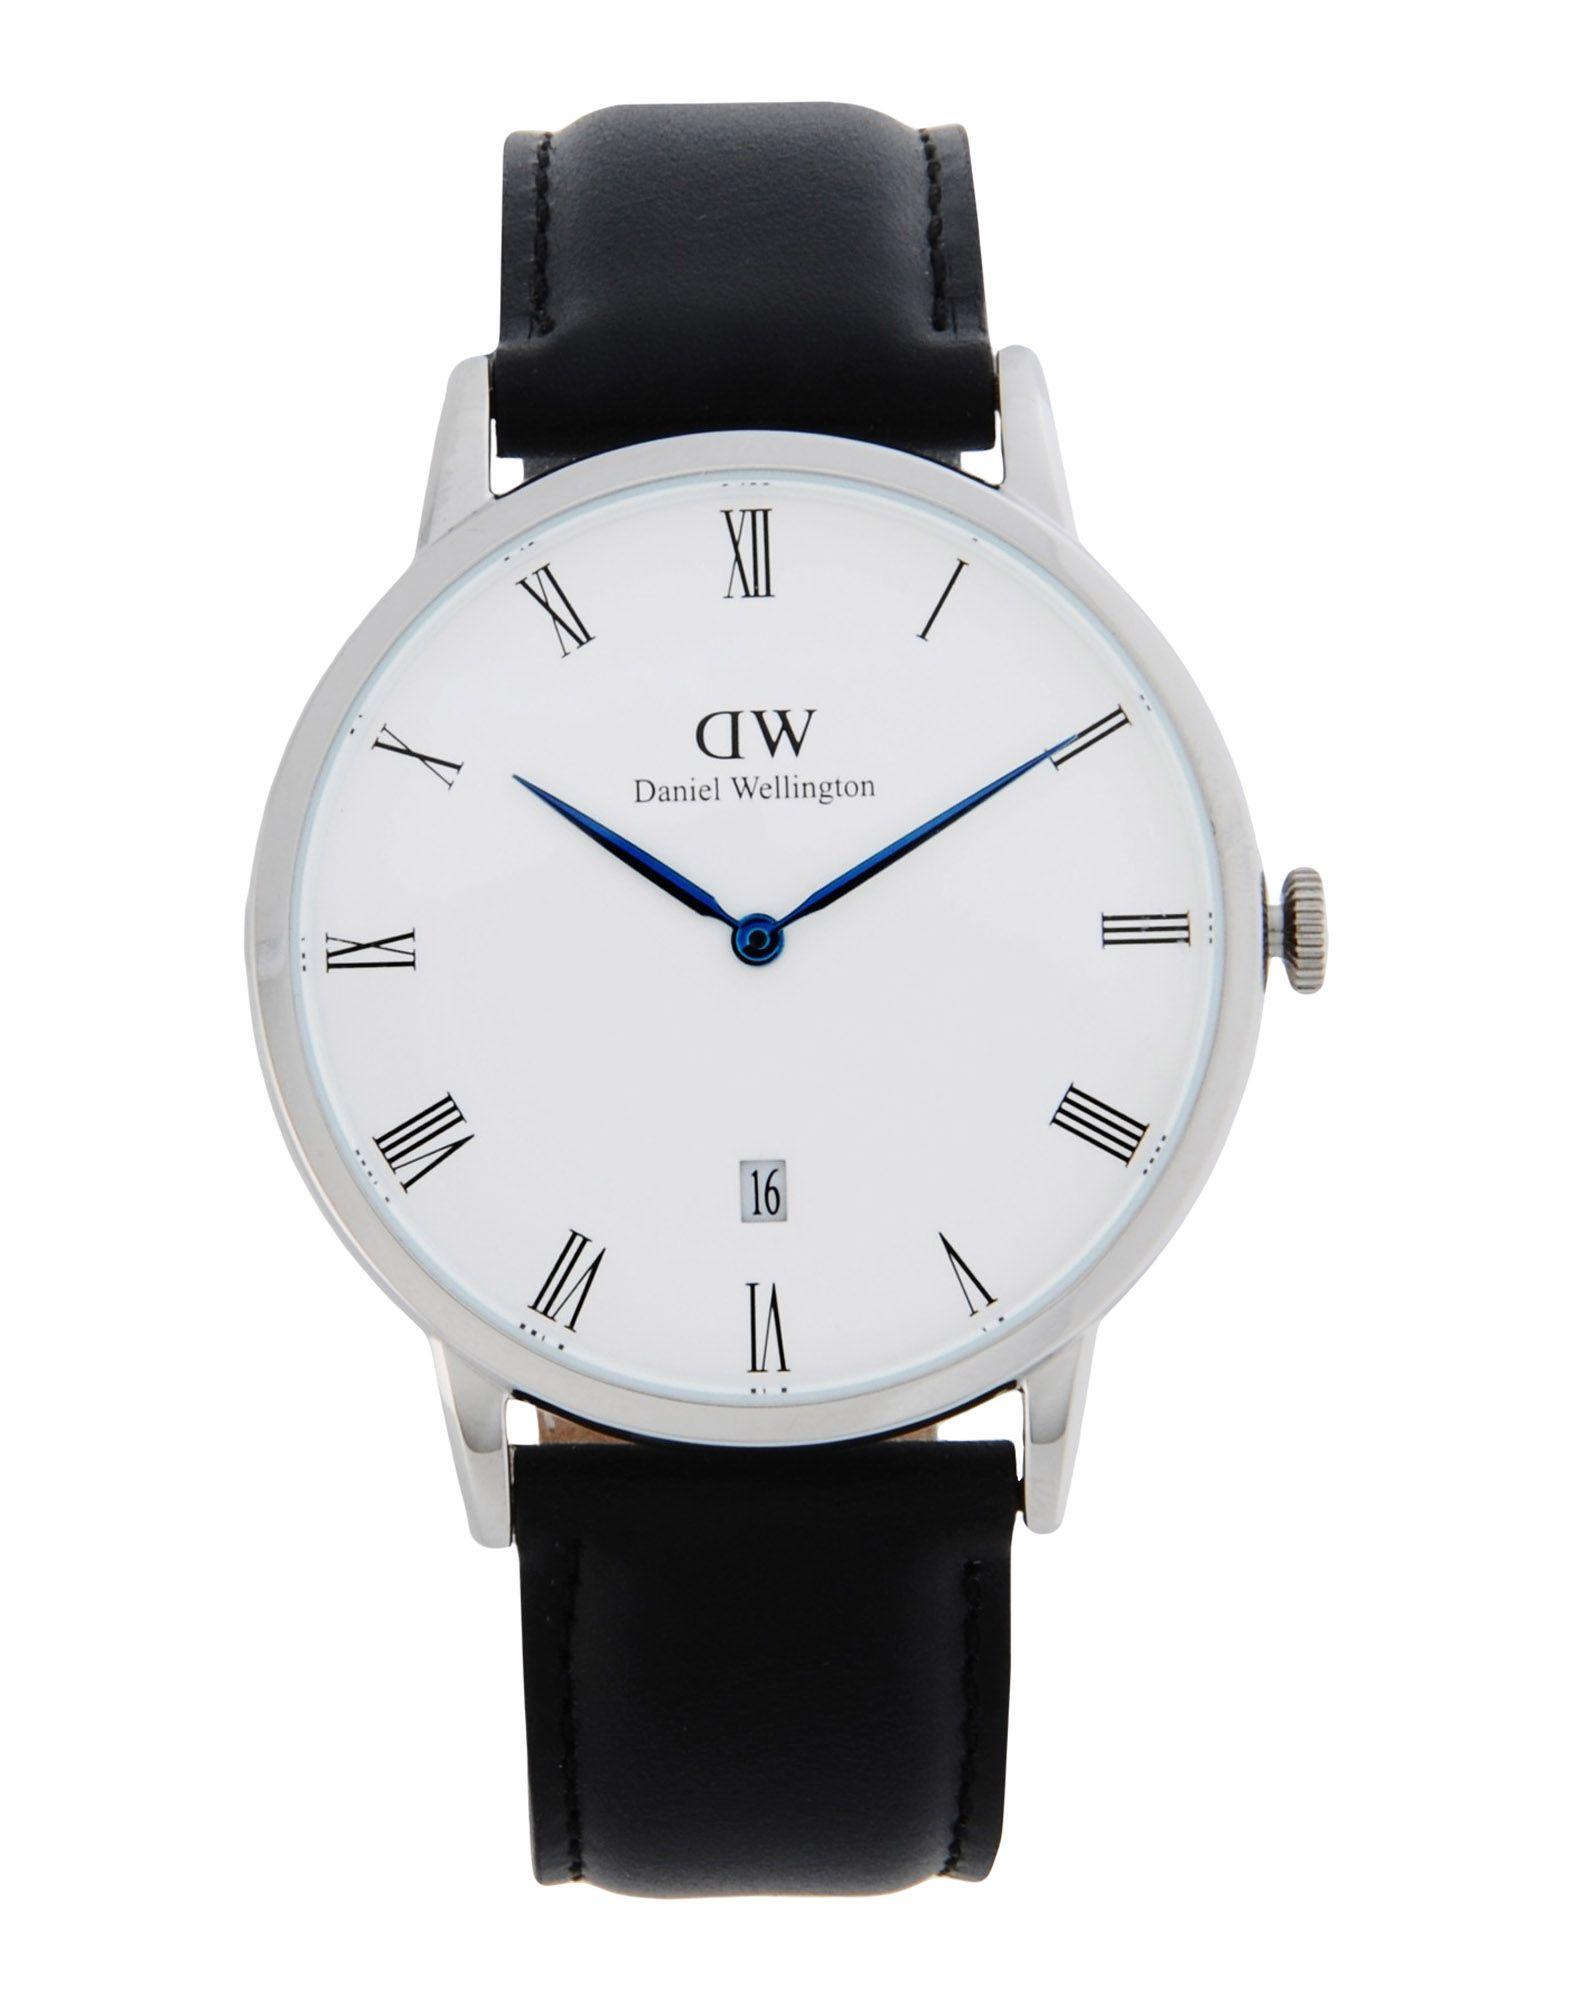 daniel wellington daniel wellington wrist watches